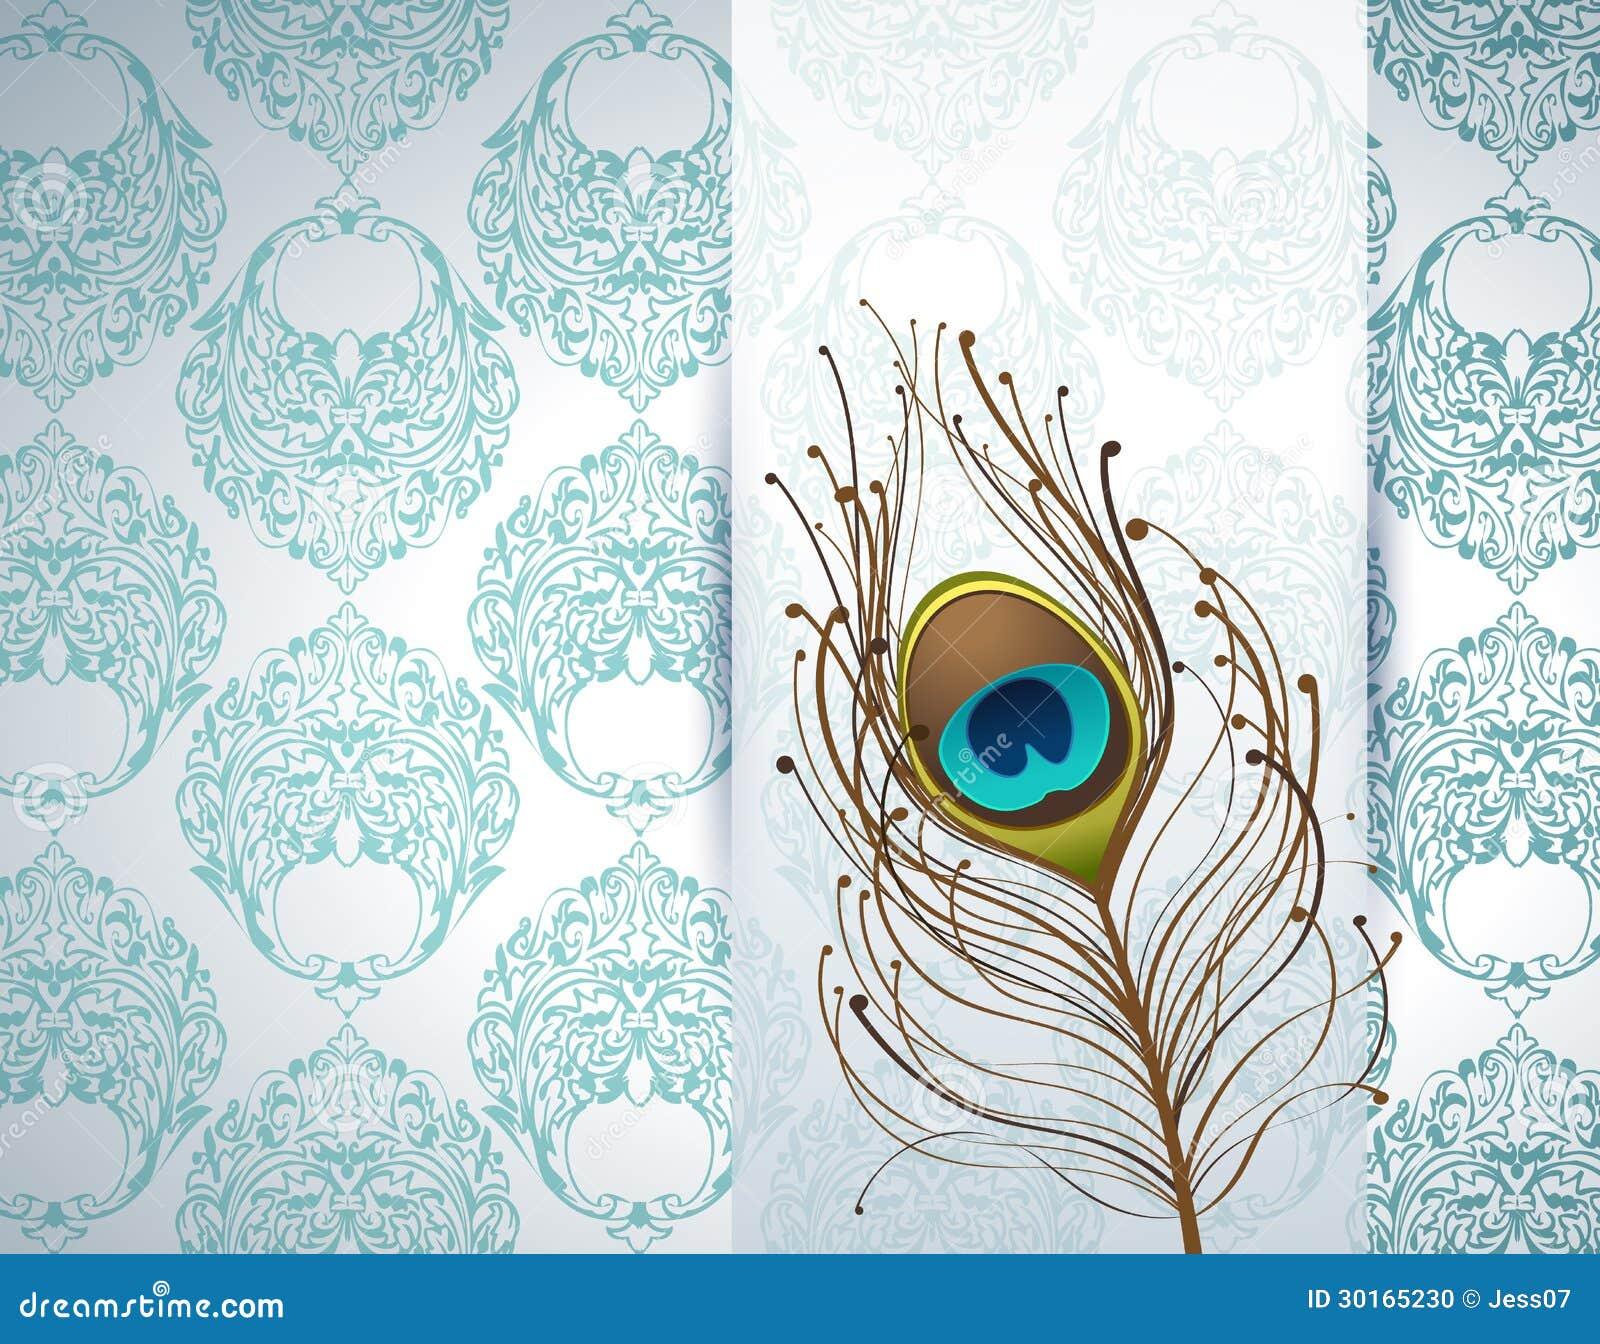 Ravelry Flax pattern by tincanknits